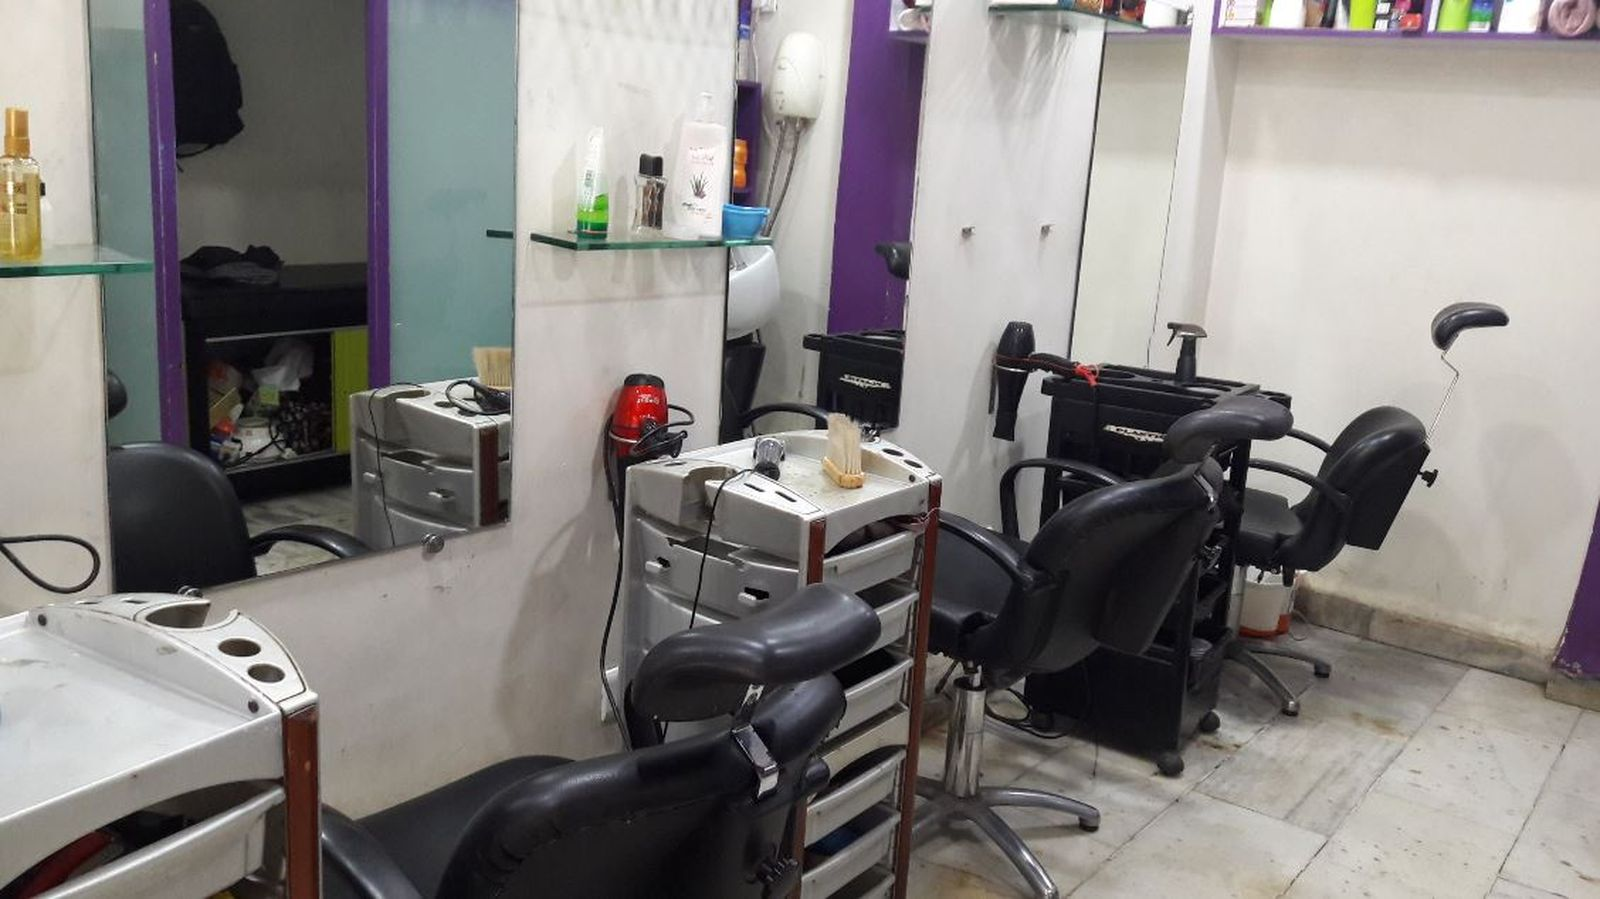 Tangler Family Salon - Malad West - Mumbai Image